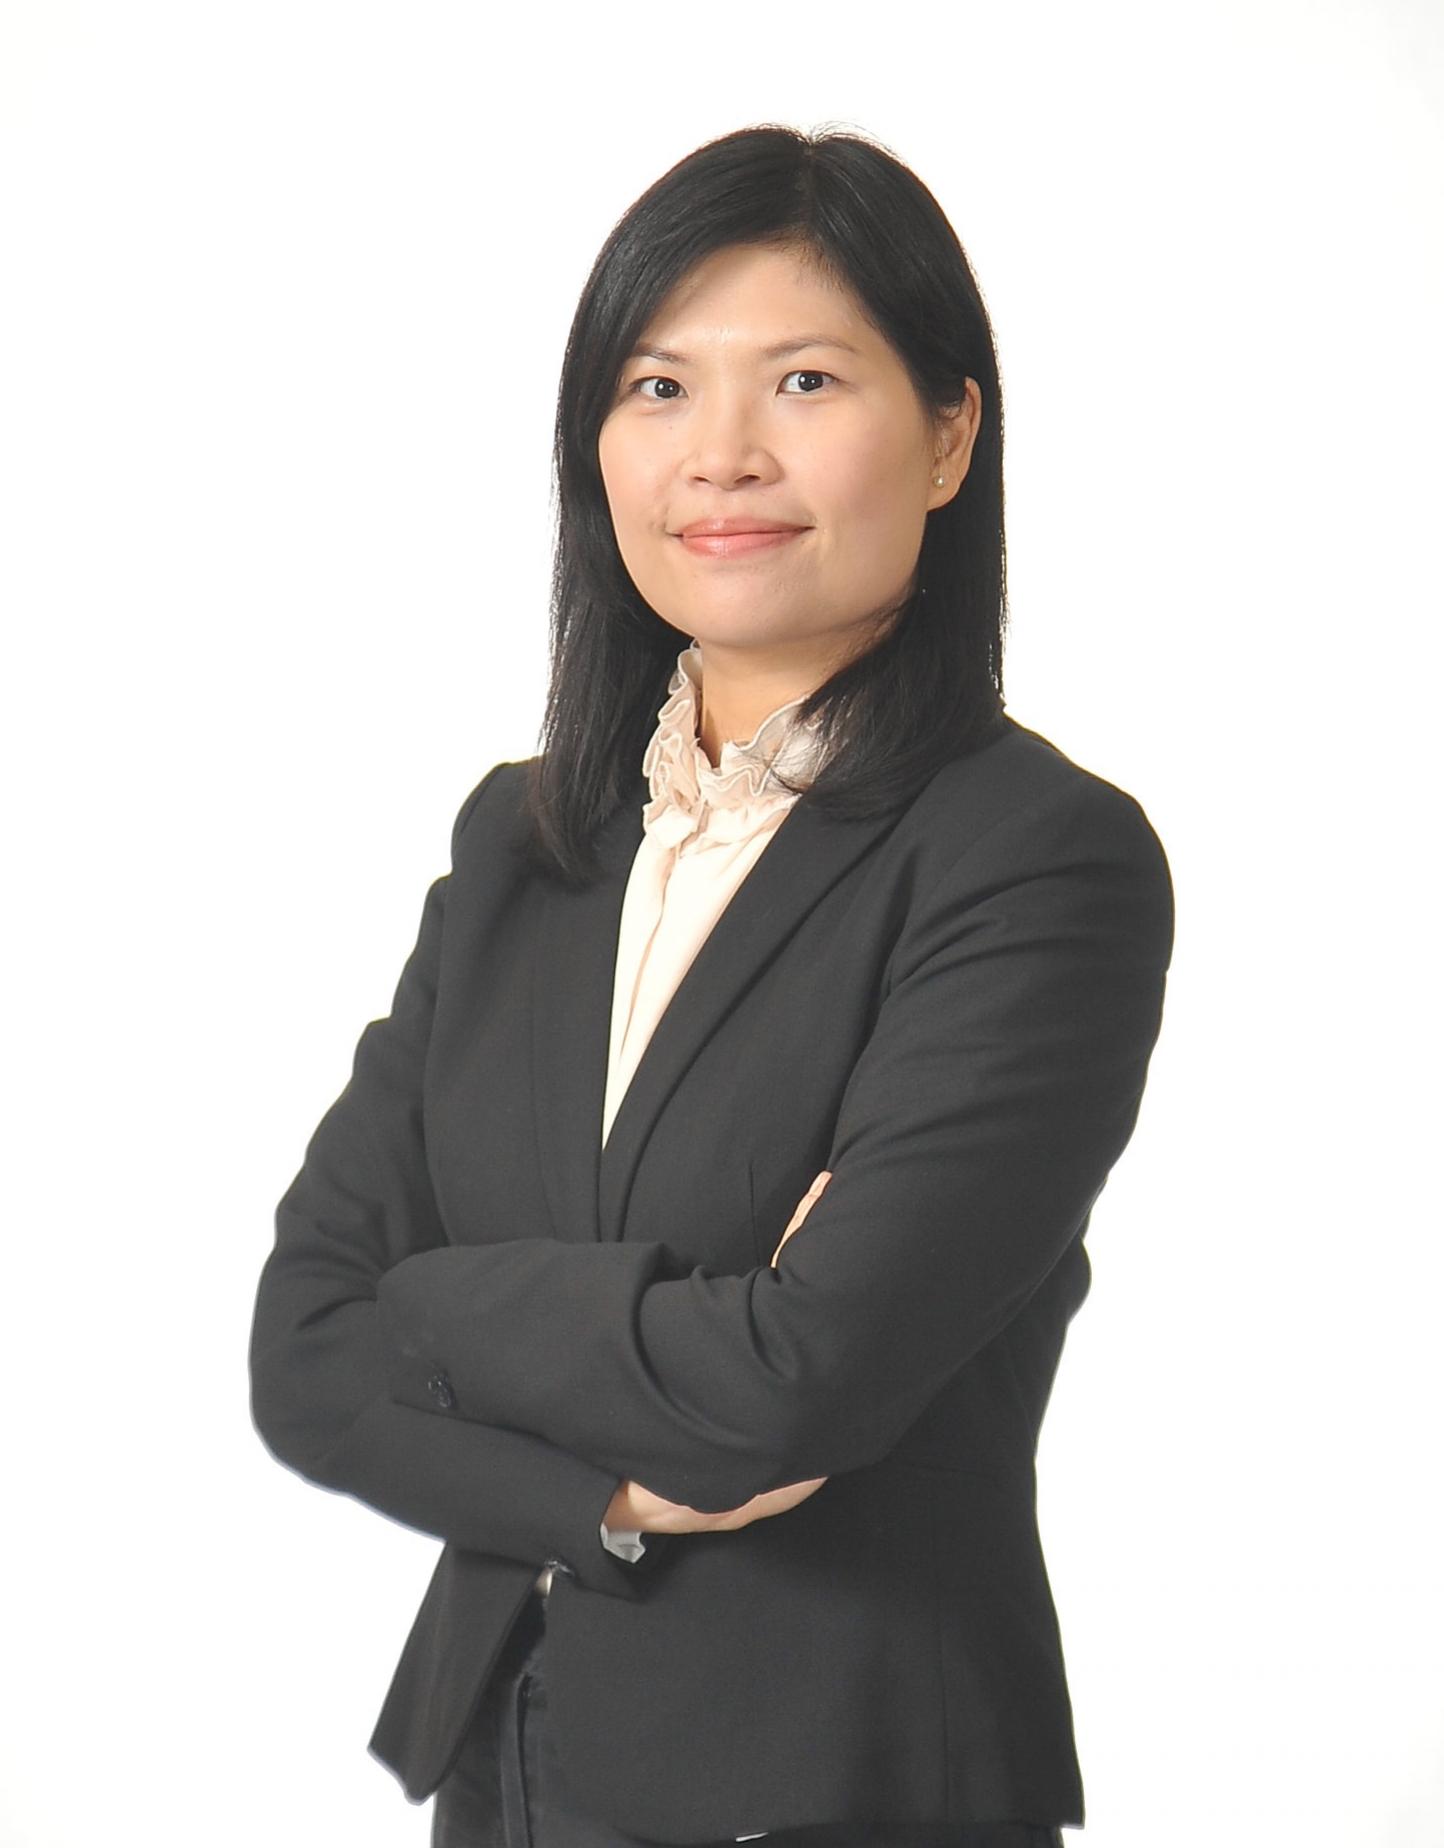 Virginia Hong